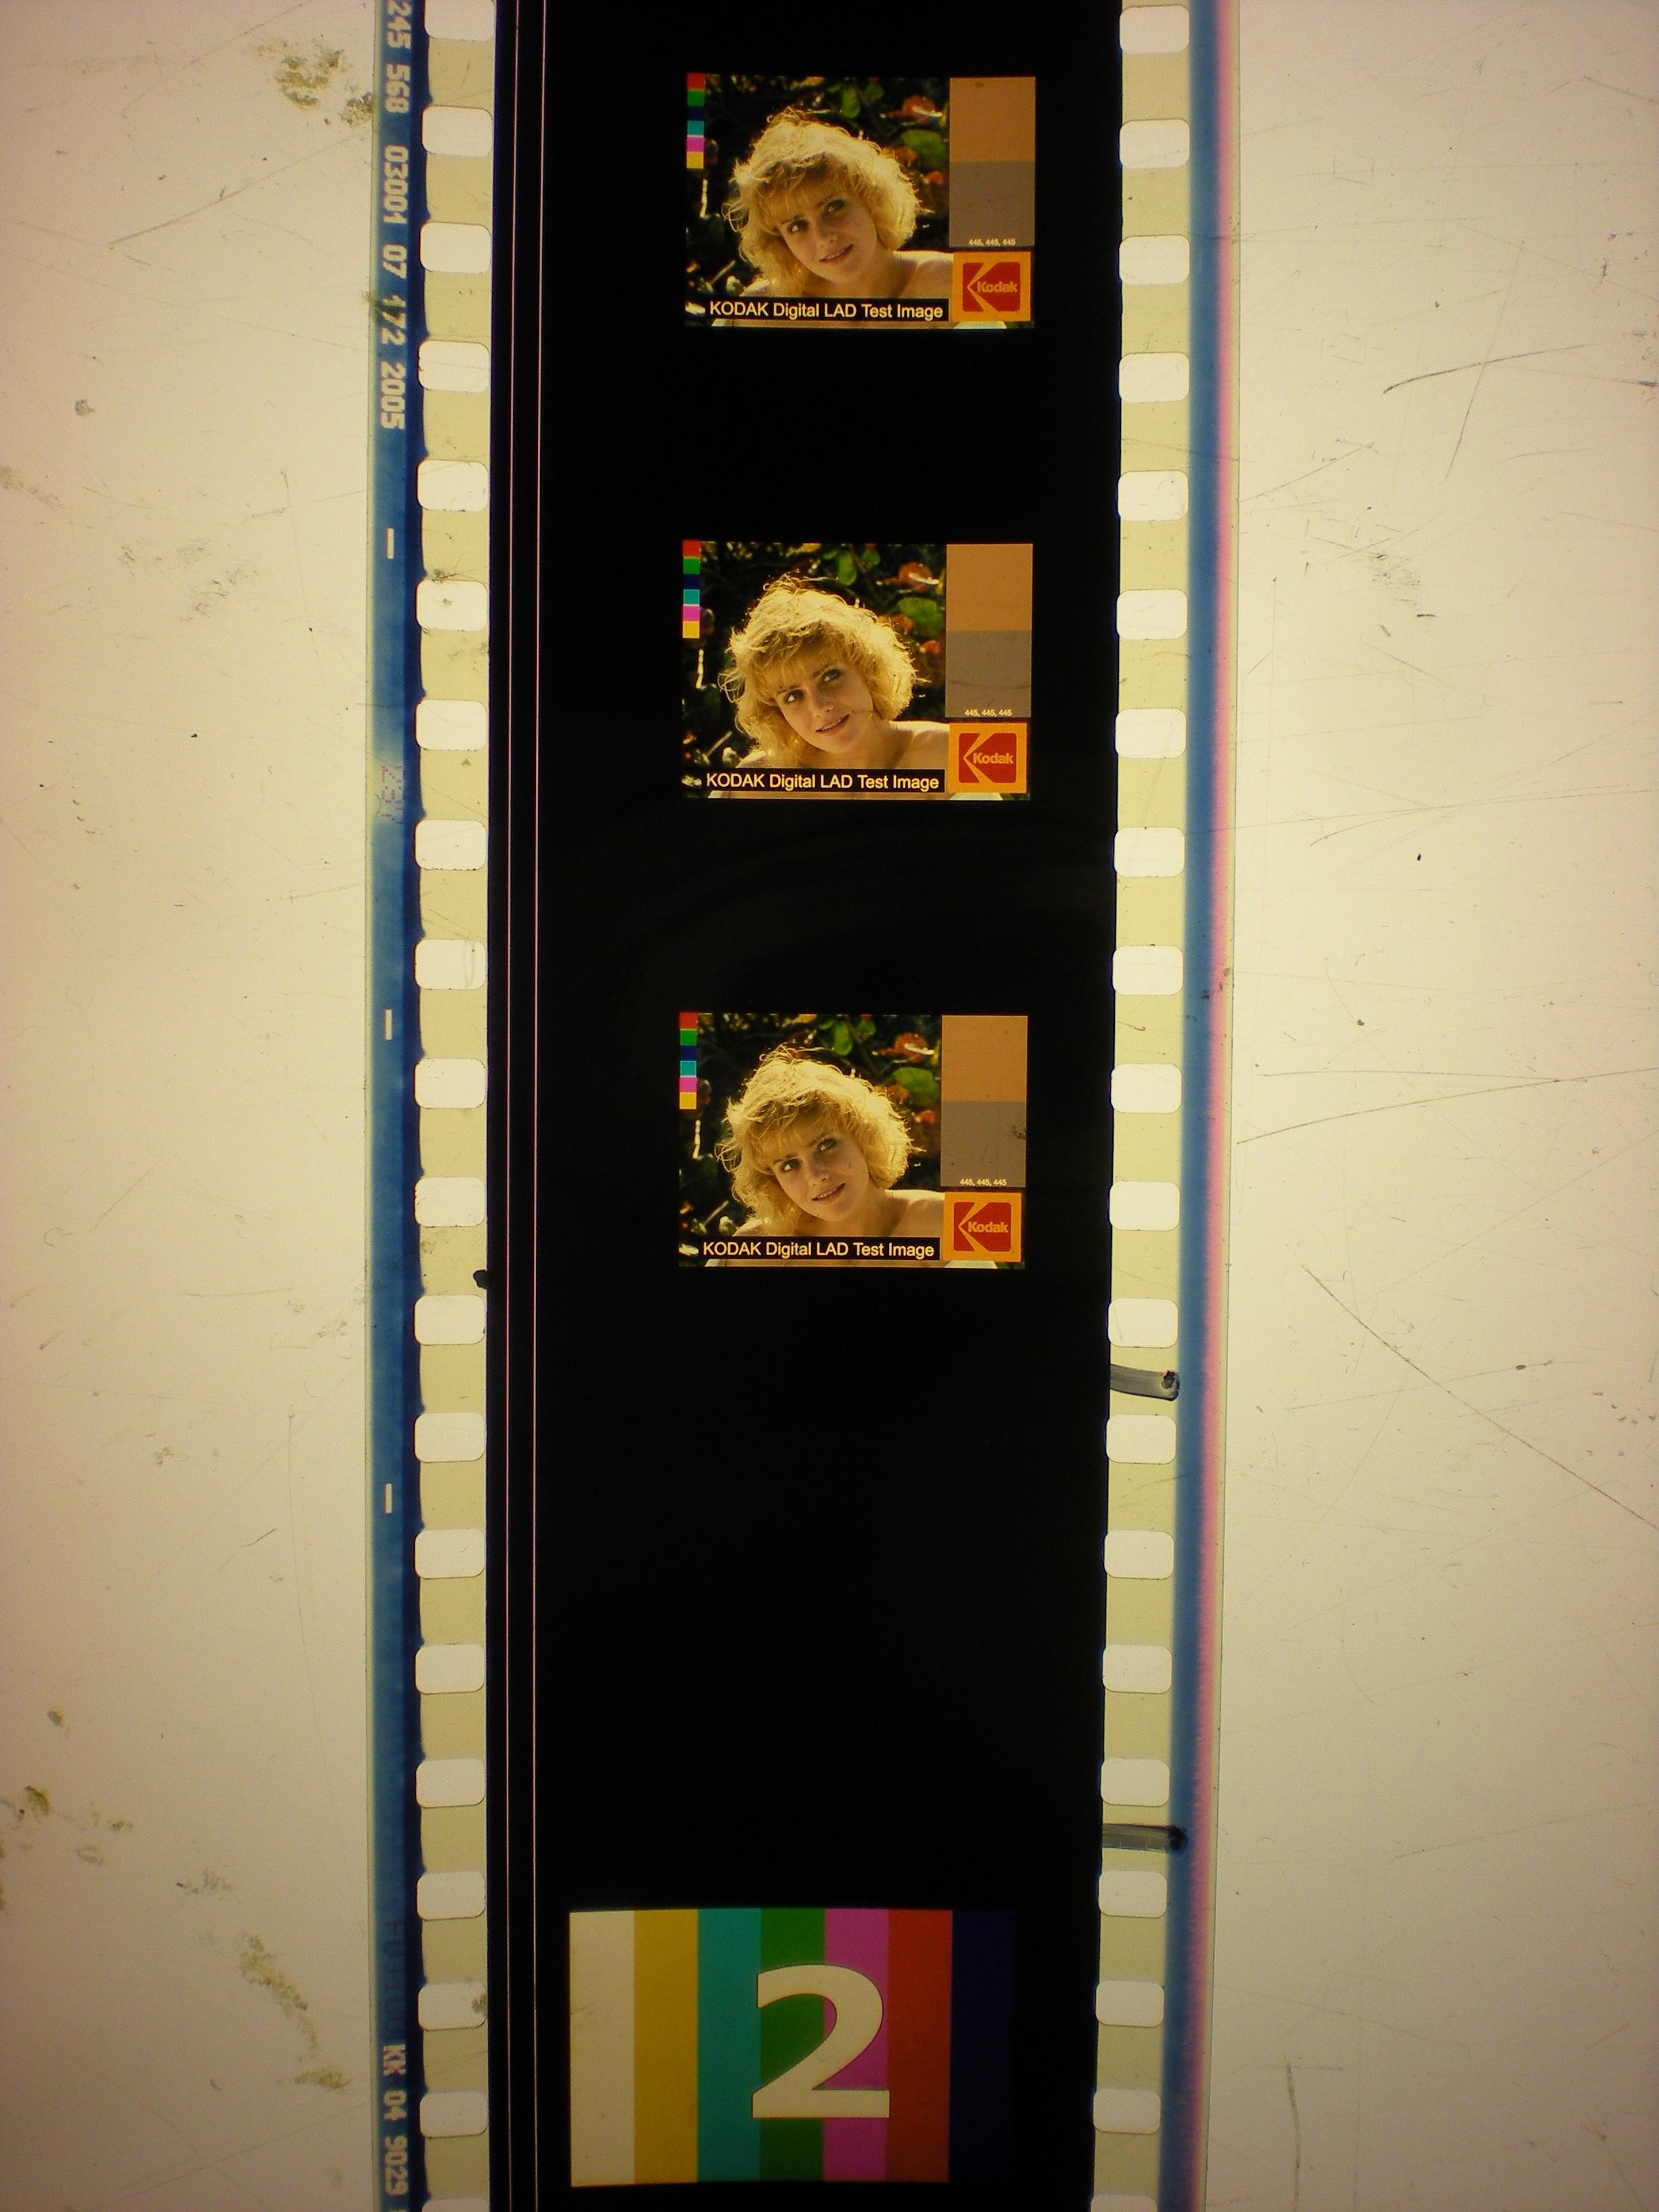 KODAK Digital LAD Test Image - tiny, for some reason!